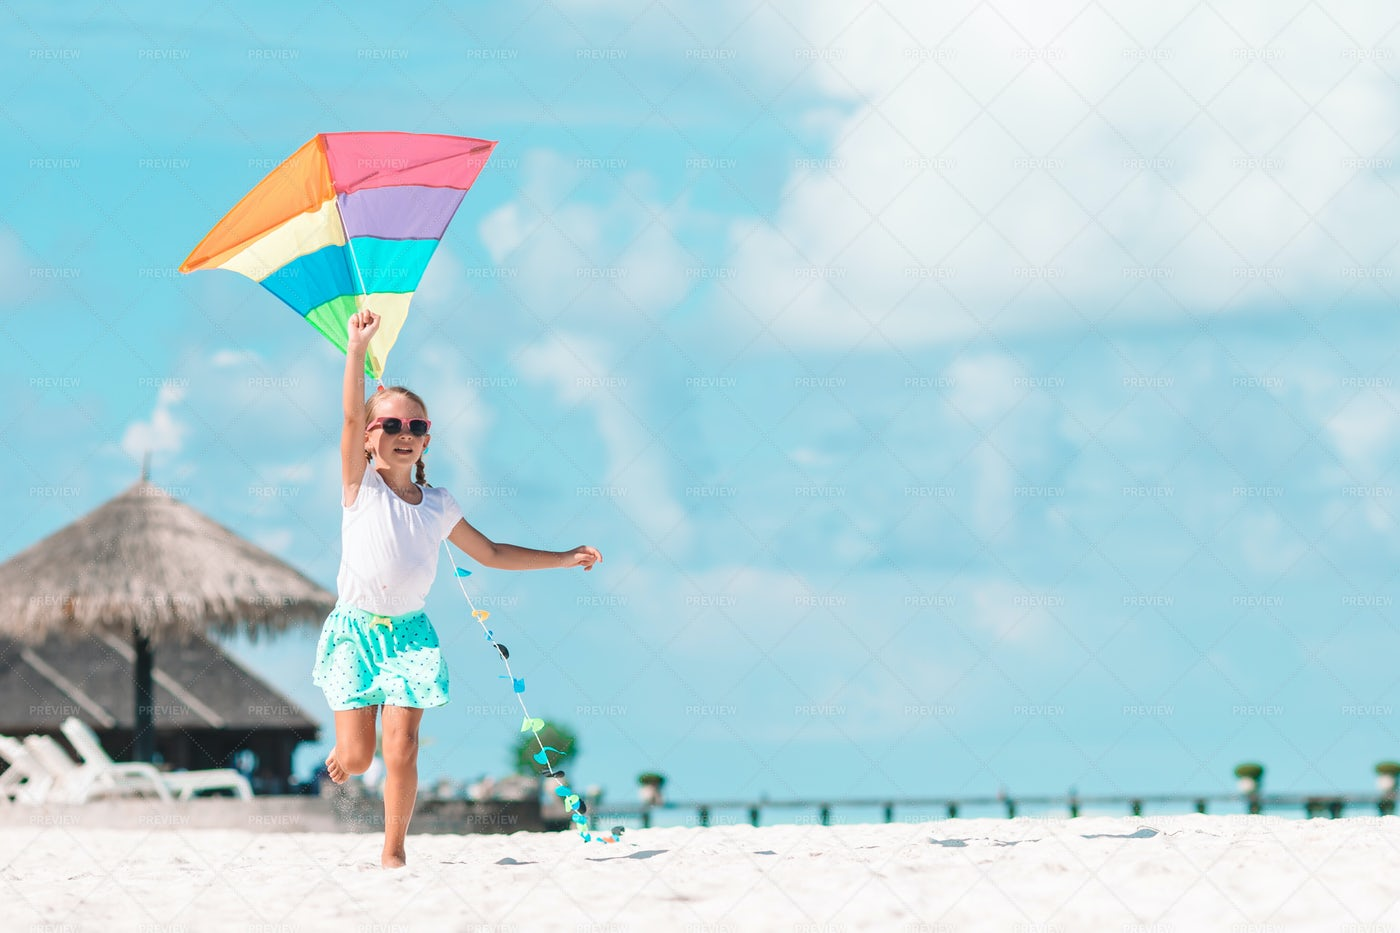 Running With Kite On Beach: Stock Photos